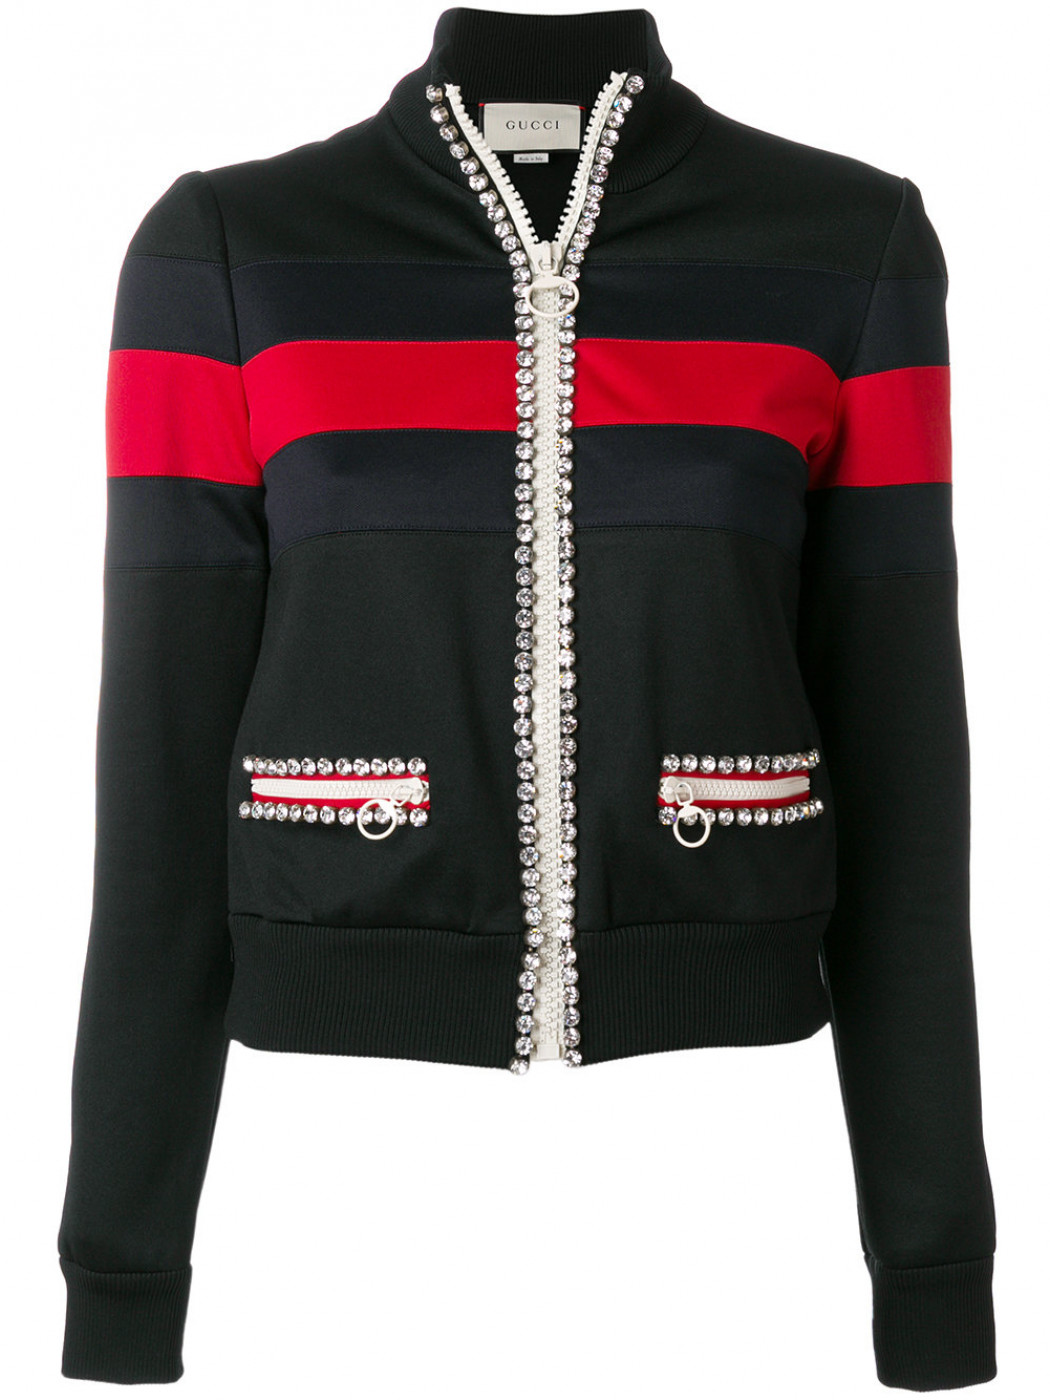 Gucci - Crystal-embellished Jersey Jacket, Gucci.com, $1,878